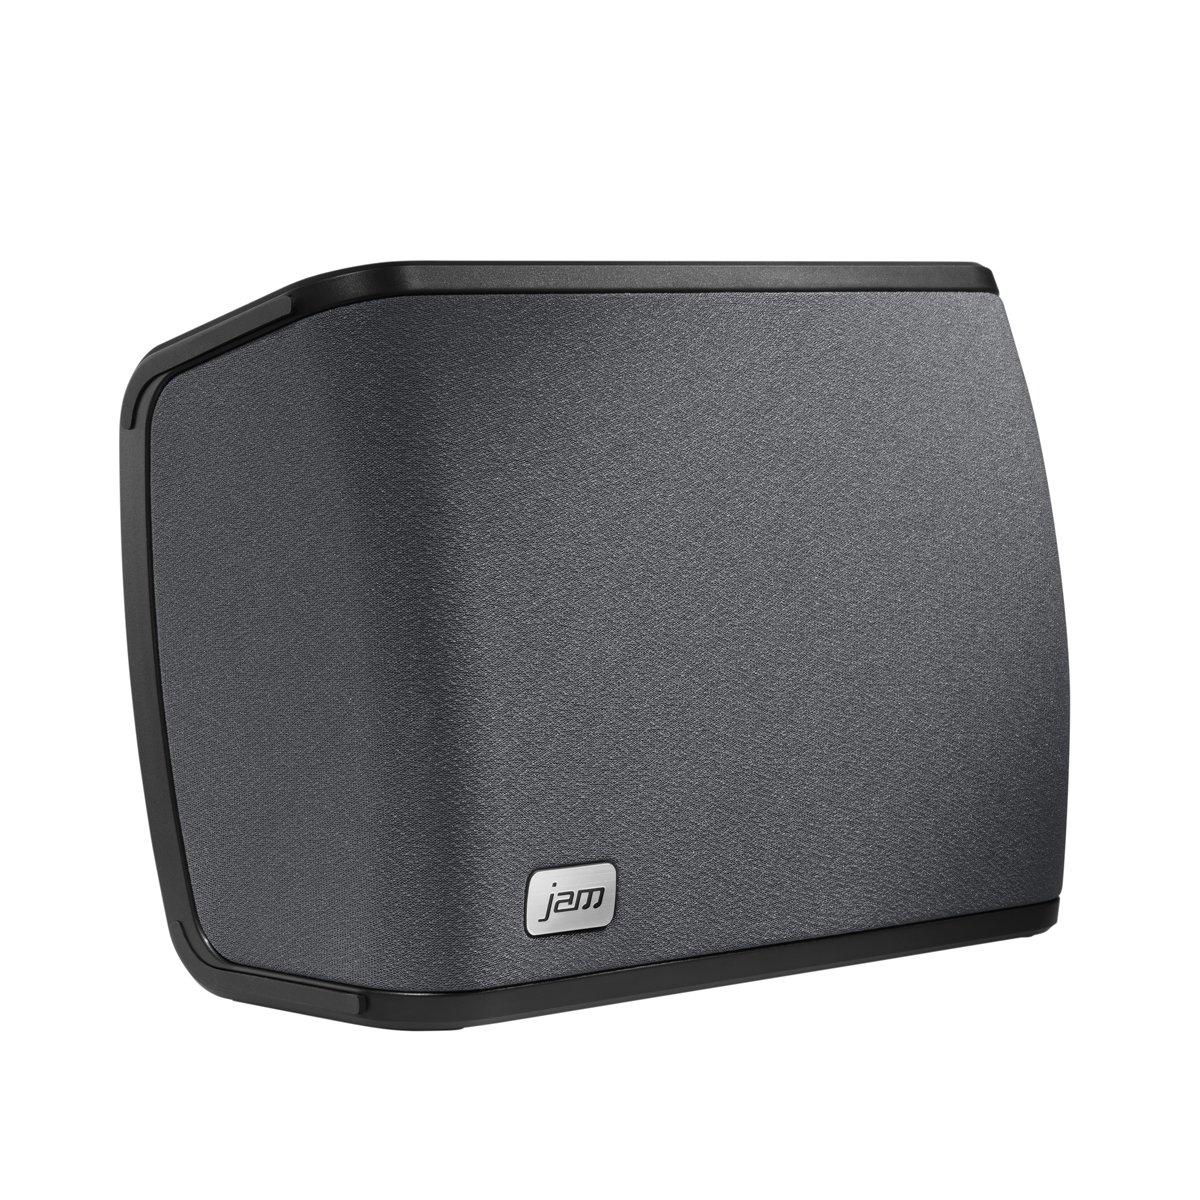 Jam Audio Rhythm Wireless Wi-Fi Speaker w/ Amazon Alexa Voice, Play 1 / Multi-Room, 2.1 Stereo Sound, Treble + Bass Adjustment, Stream Your Personal Music Library, Spotify etc. with Free JAM App